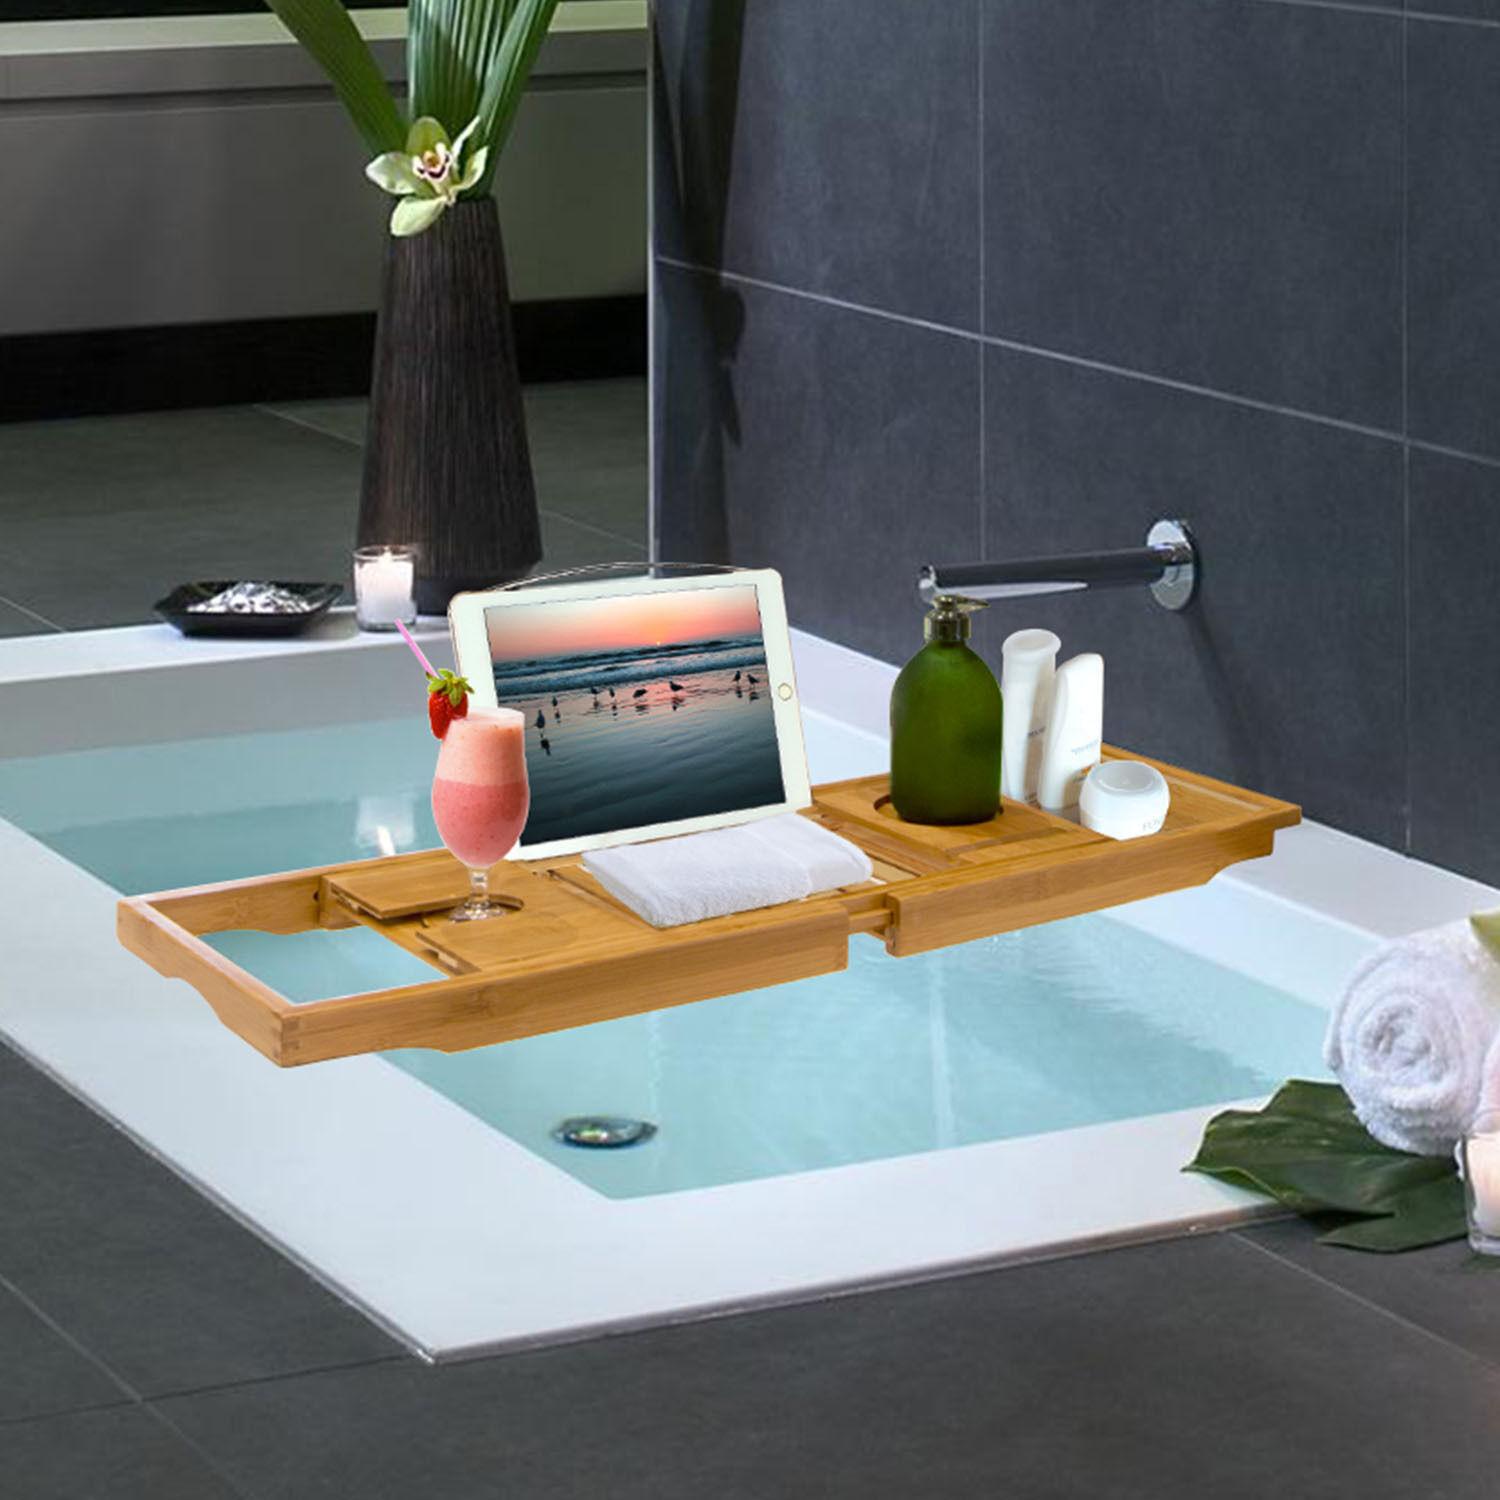 image of reisa bath home pillow cloth caddy tub bamboo decor by bathtub